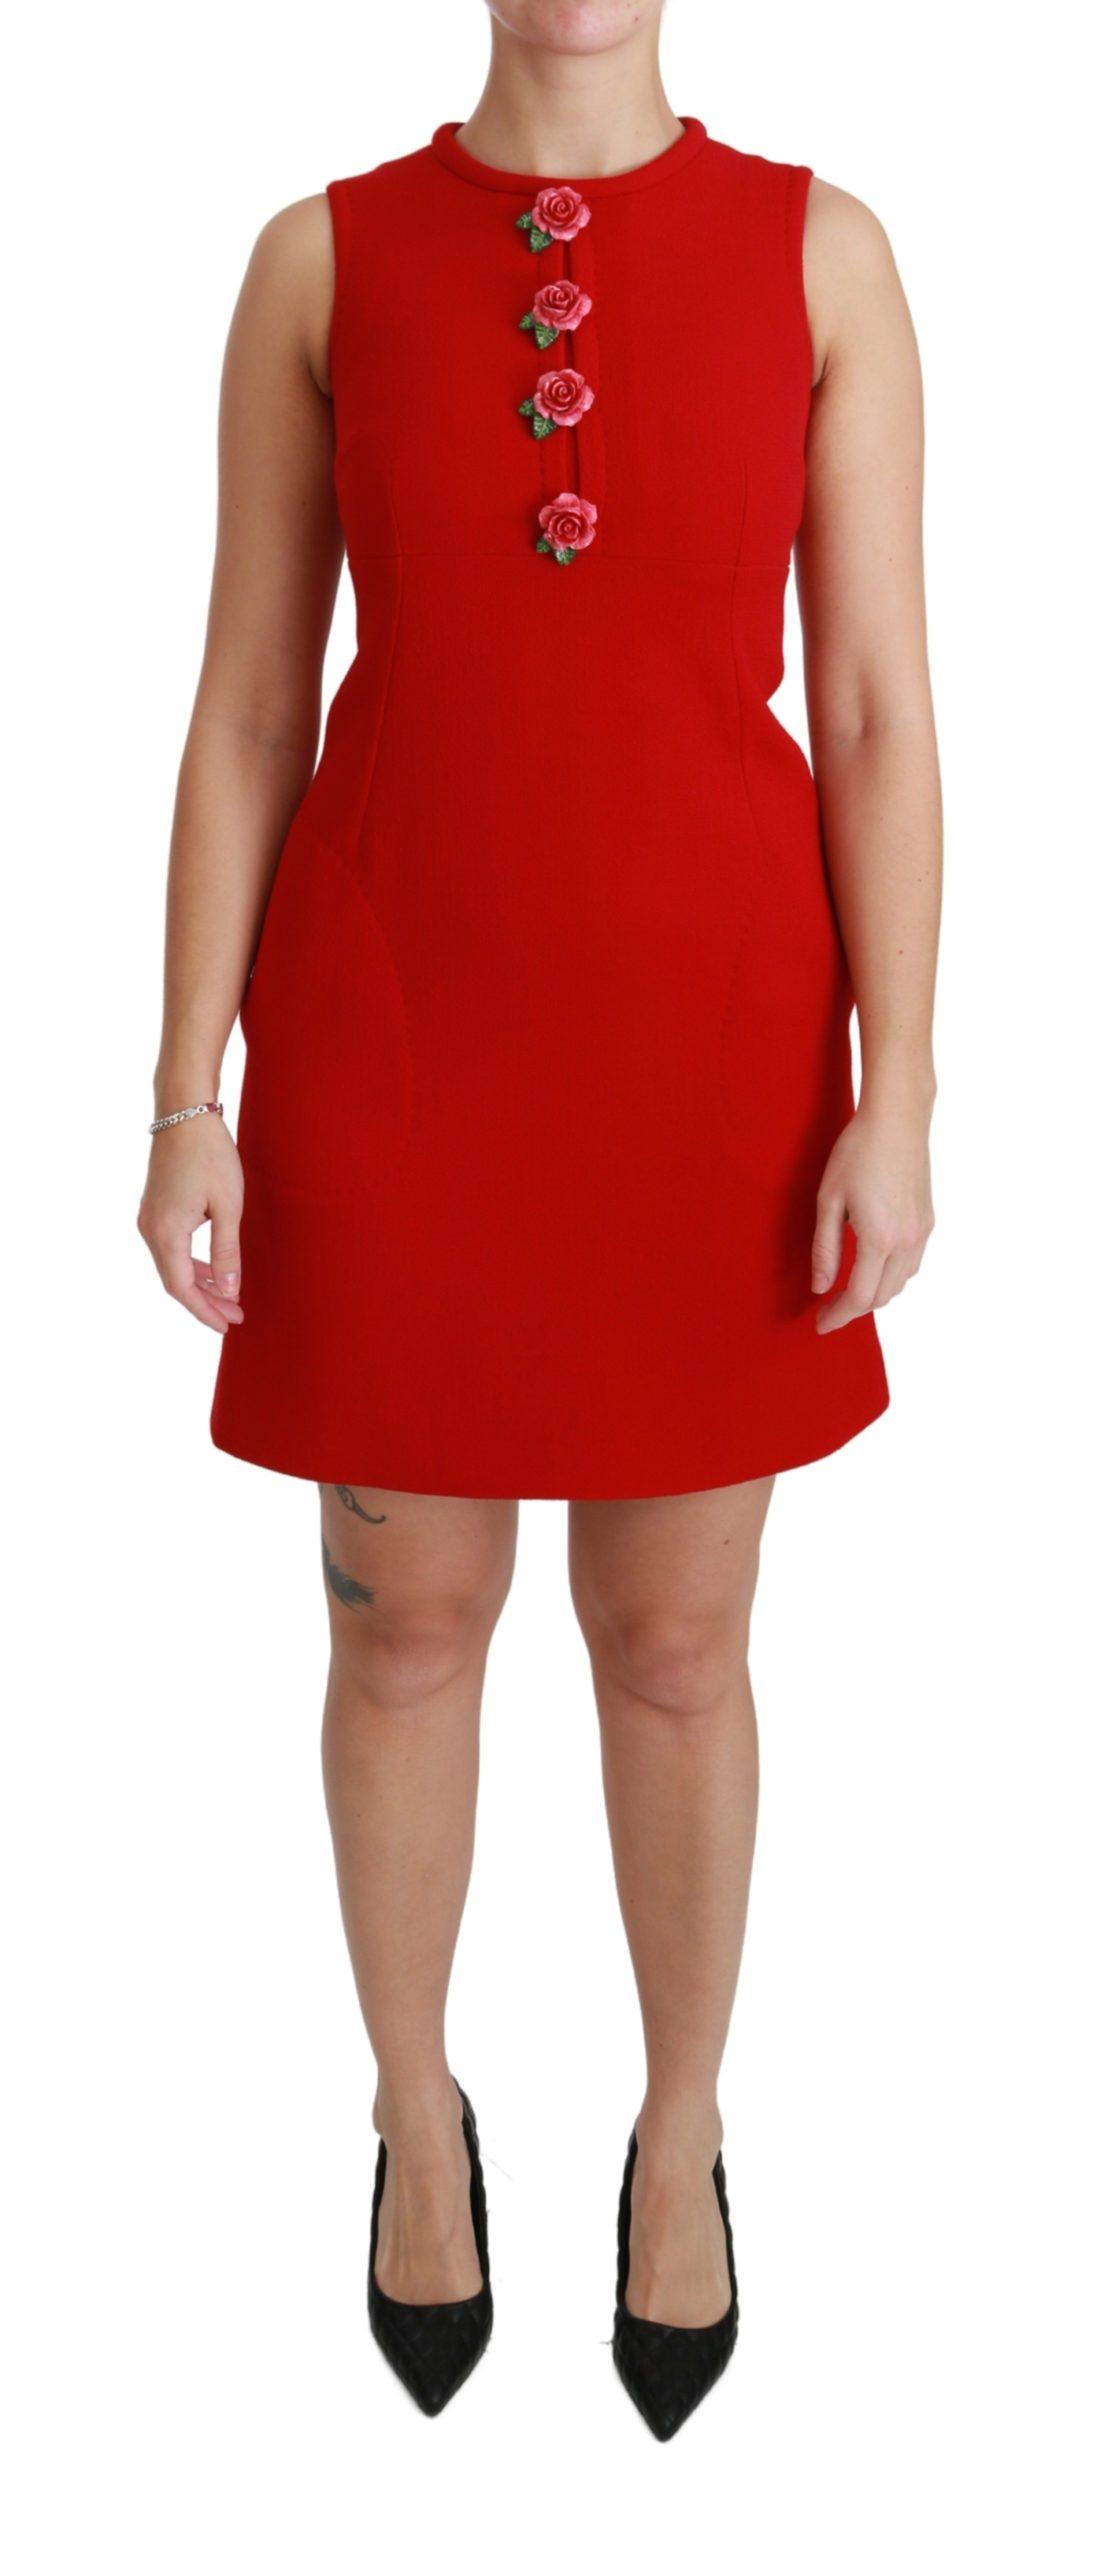 Dolce & Gabbana Women's Wool Roses Shift Mini Gown Dress Red DR2466 - IT46|XL